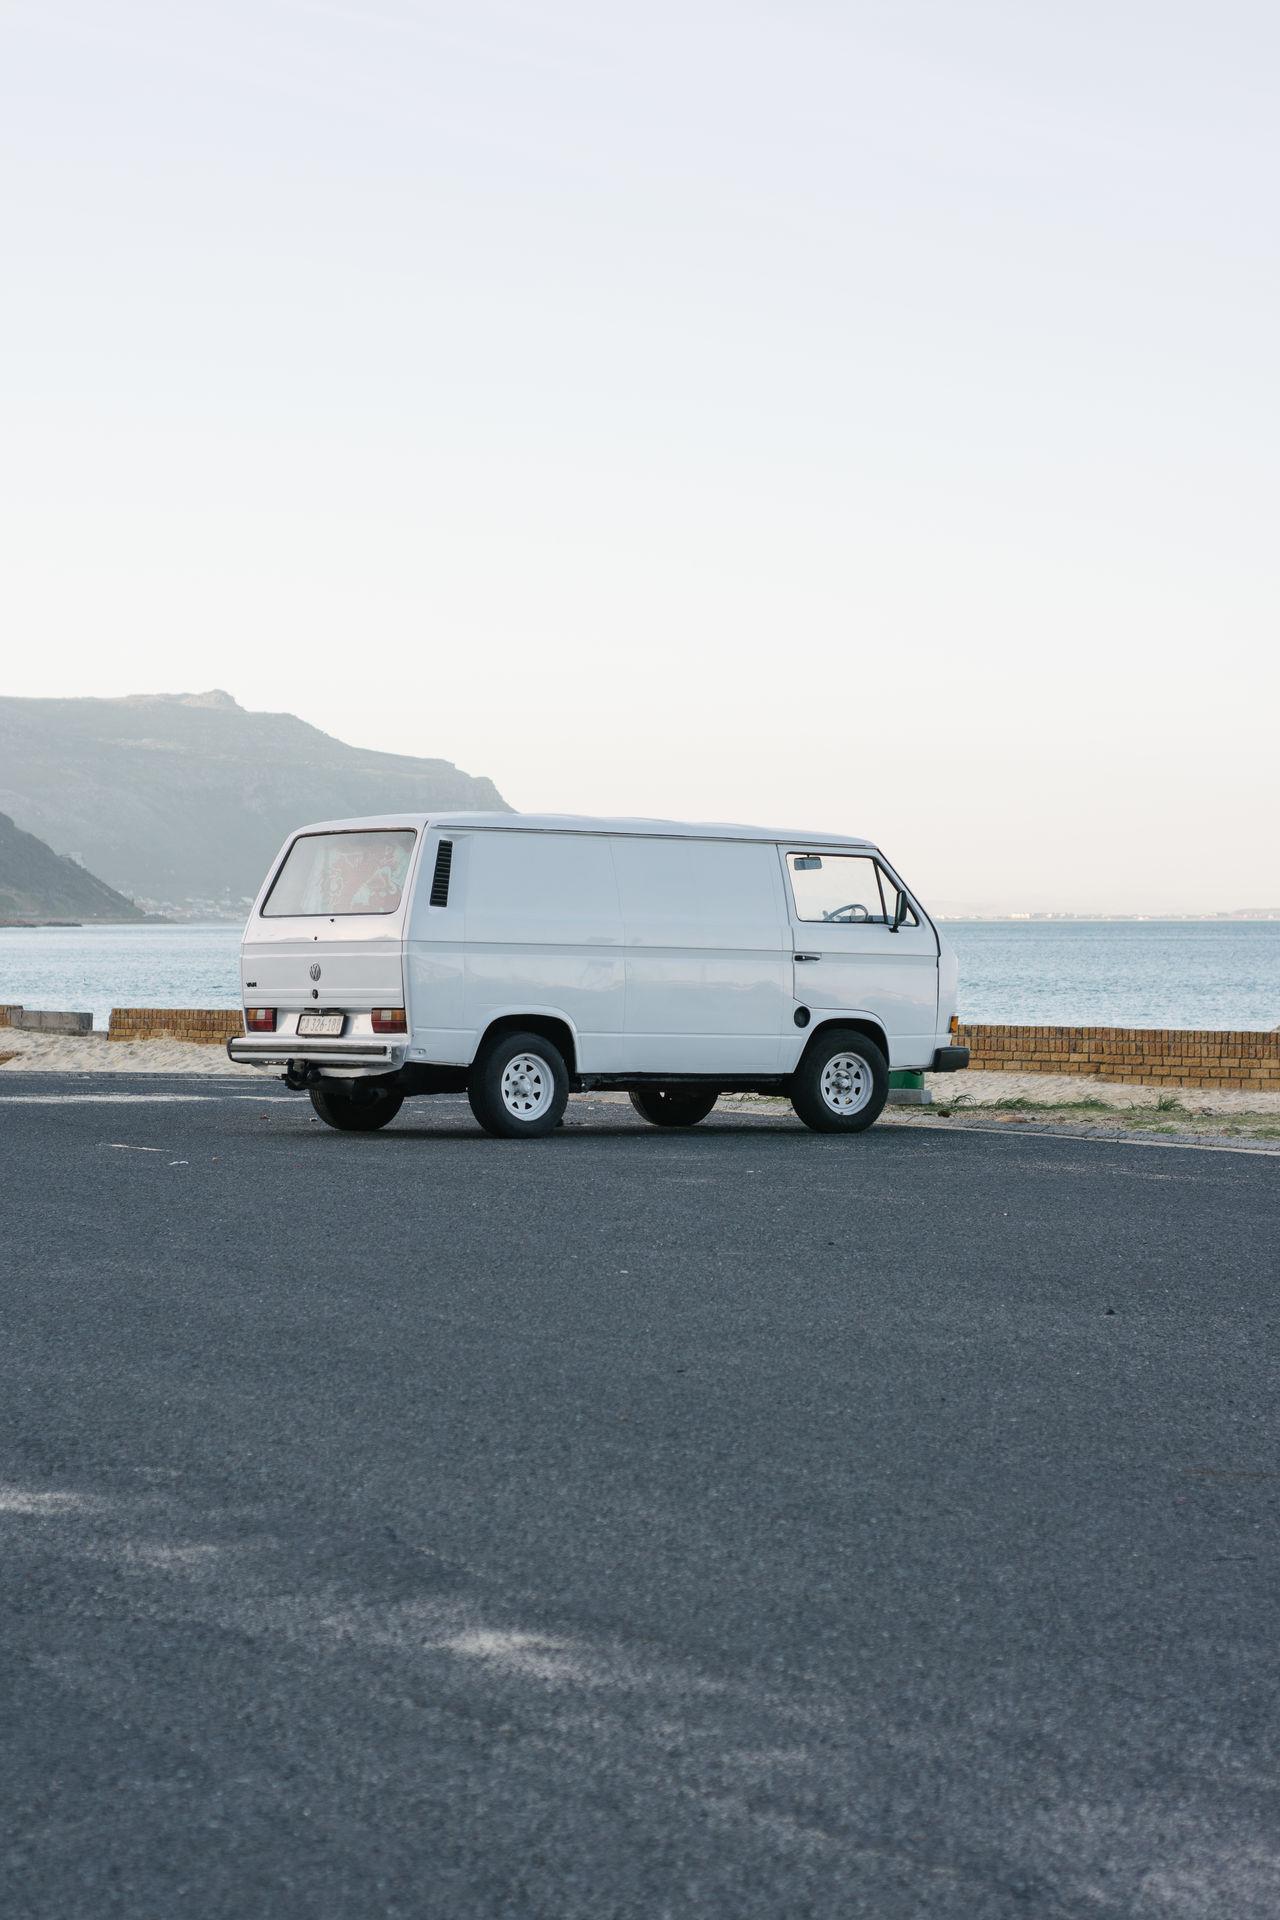 VW Kombi Parked by the beach. Beach Vw Camper Van VW Kombi White Car First Eyeem Photo